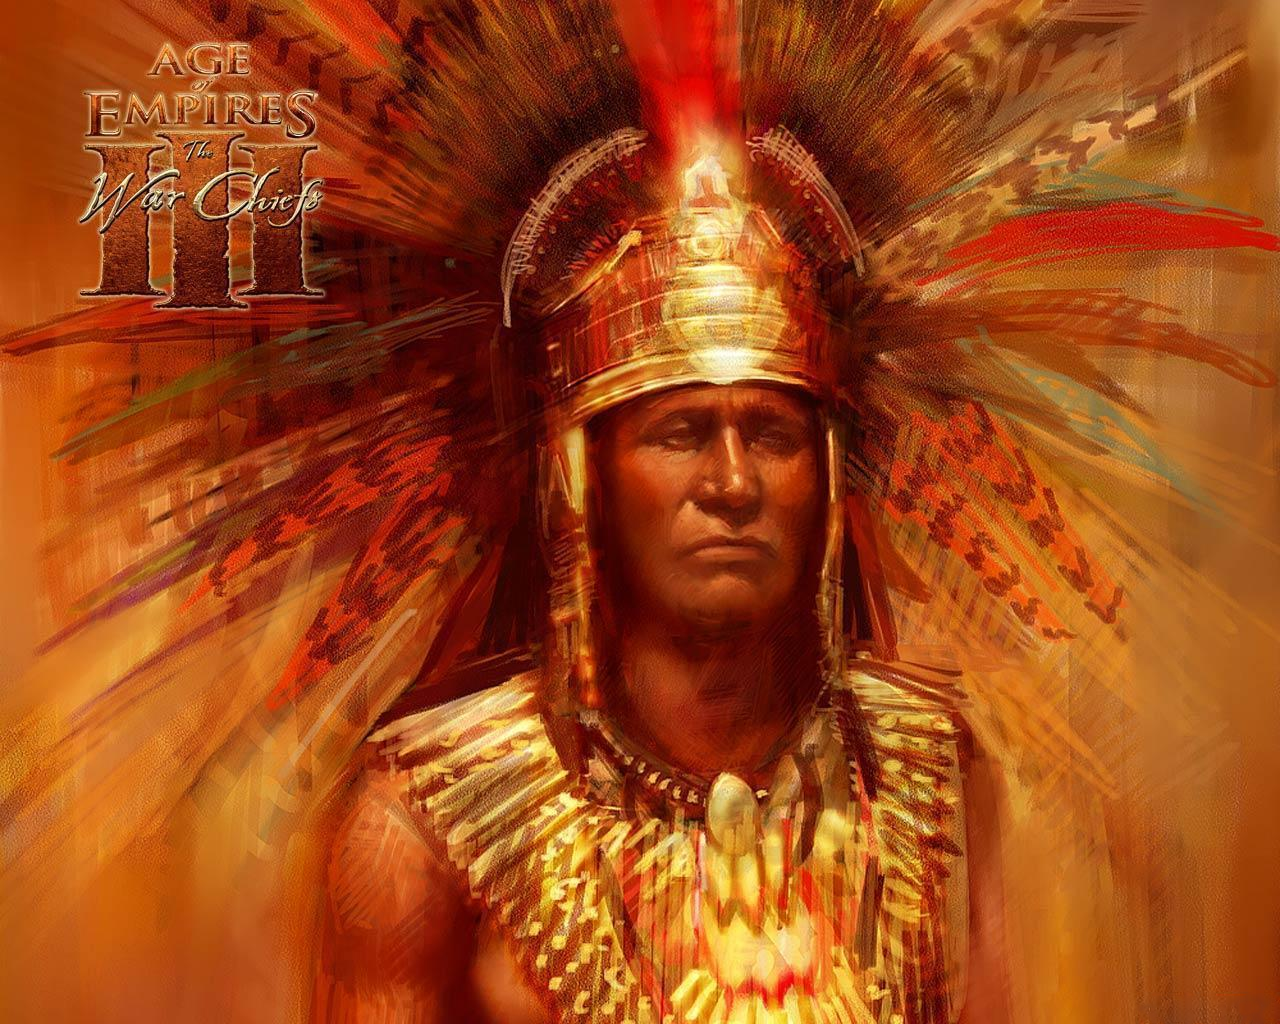 Cuauhtemoc (Age of Empires III)